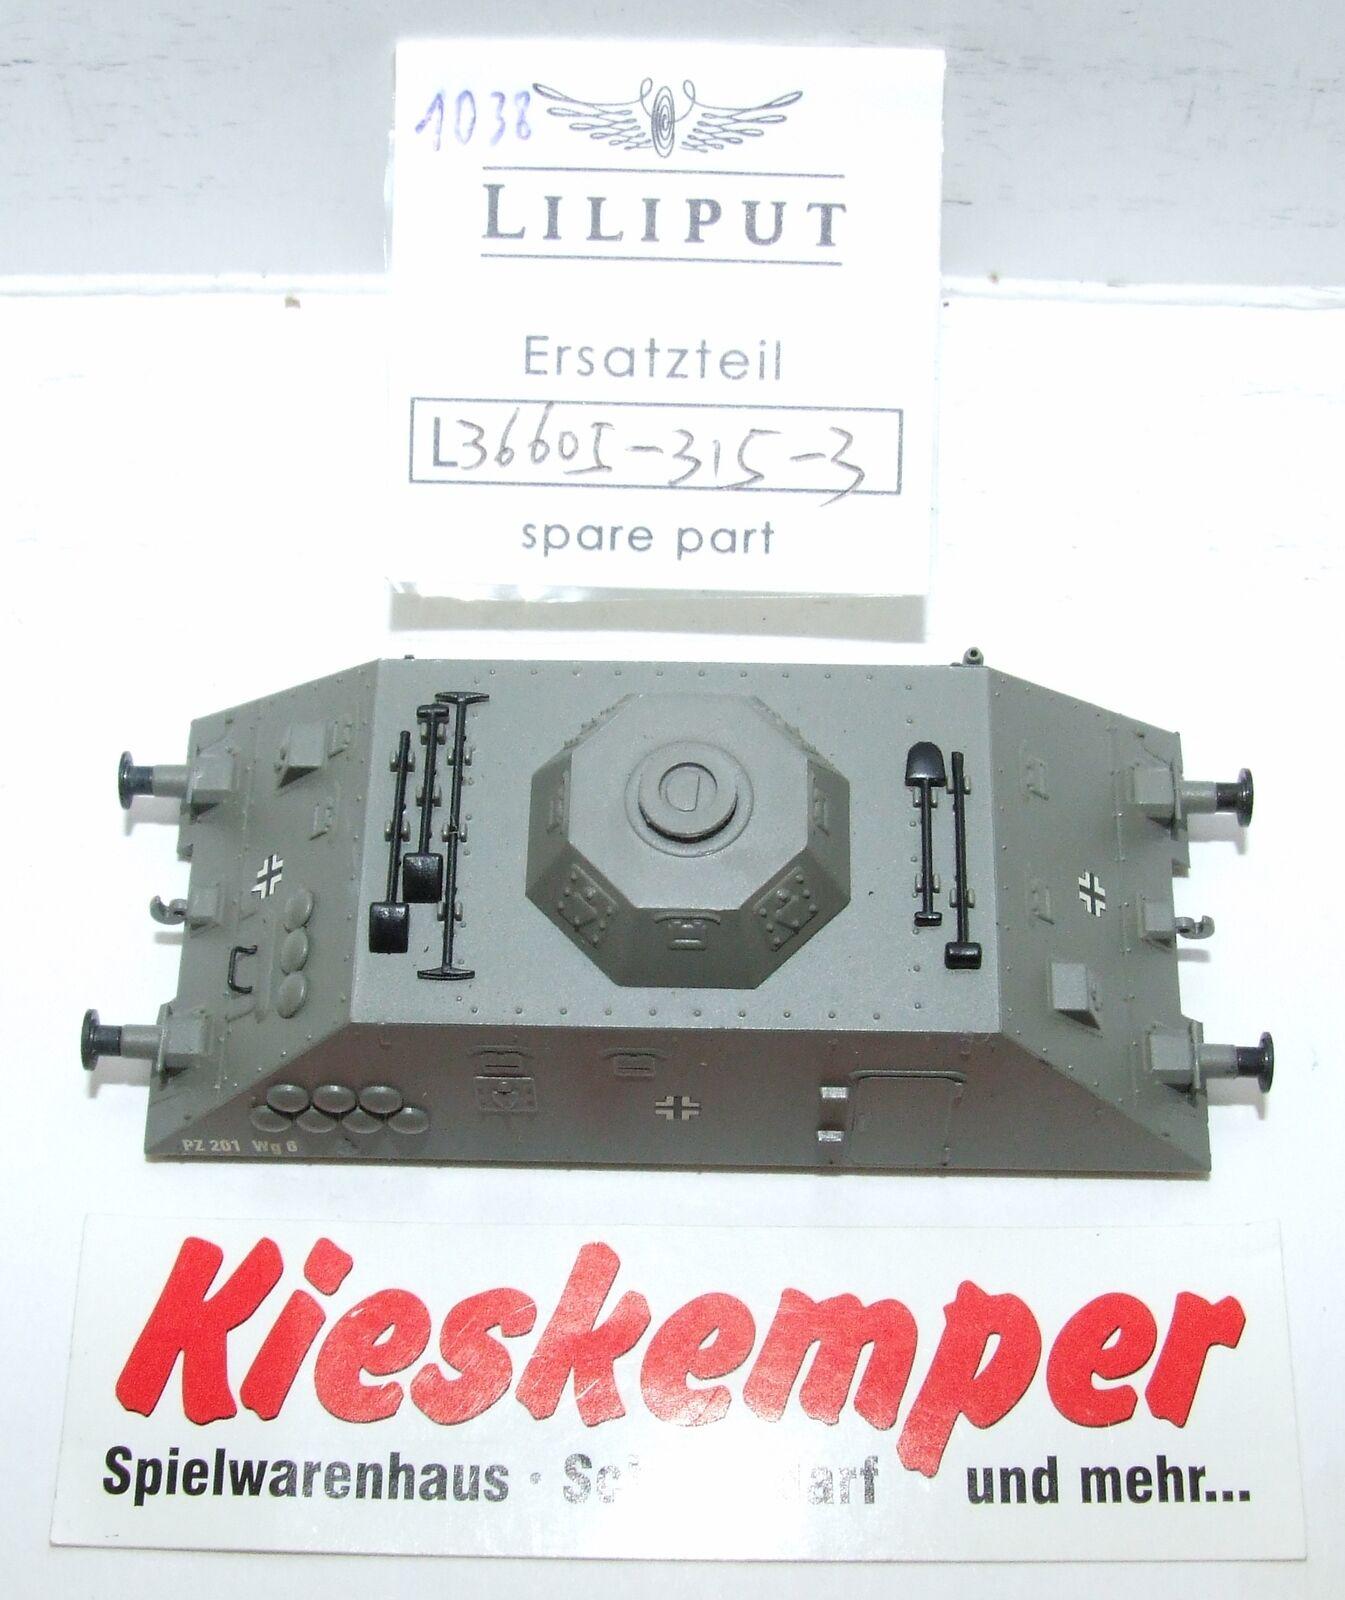 Lo1038 LILIPUT LILIPUT LILIPUT H0L 366053153 CARCASA GRIS pz 201 wg6 Pieza Repuesto Para Panzer  entrega de rayos